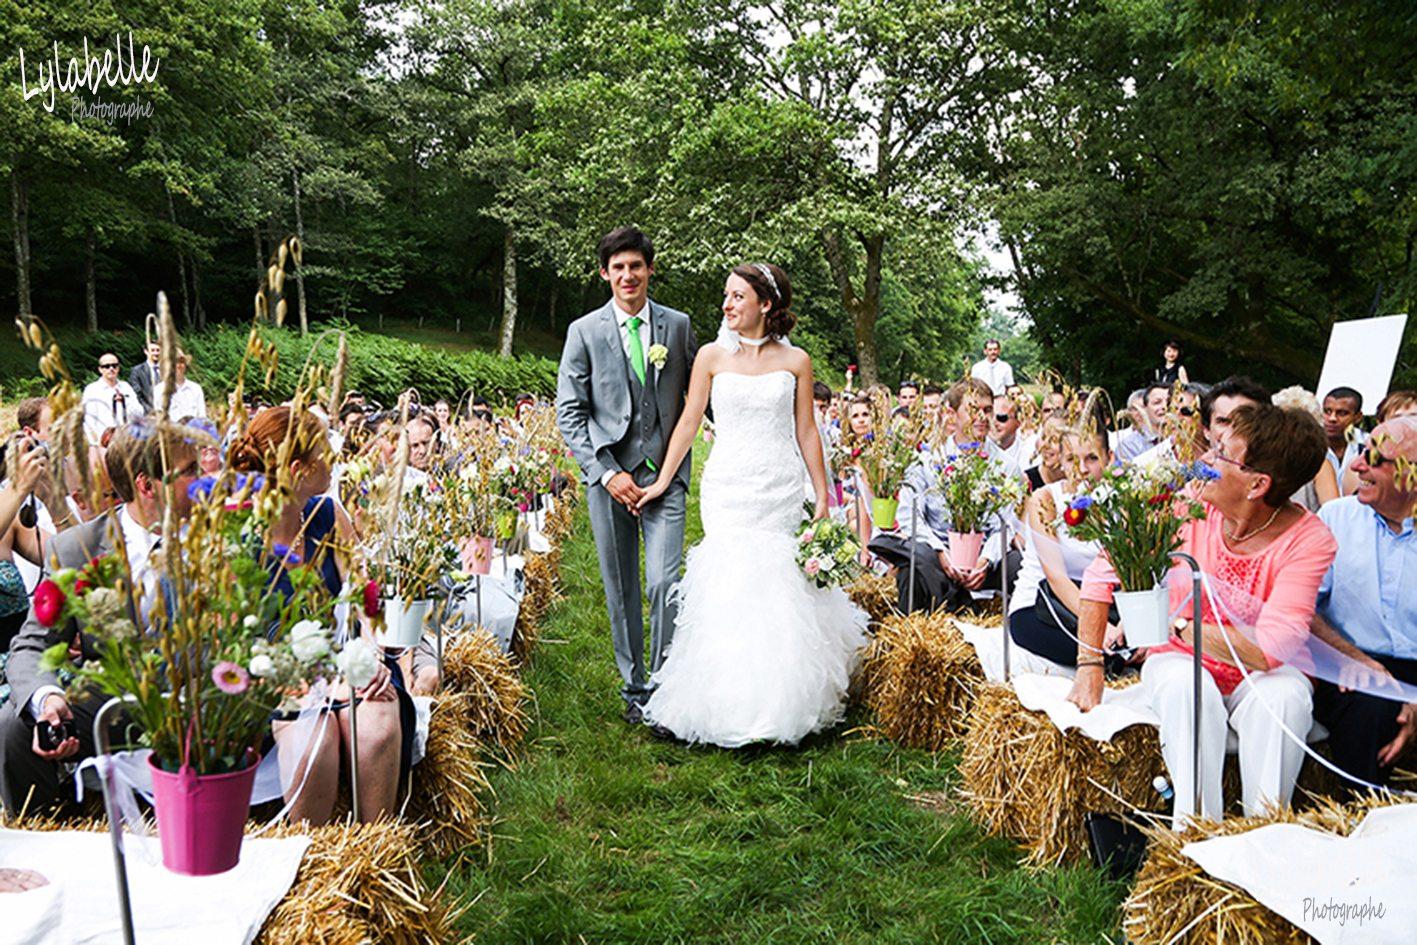 Extrêmement Mariage: Joli mariage rustique & champêtre - NW22